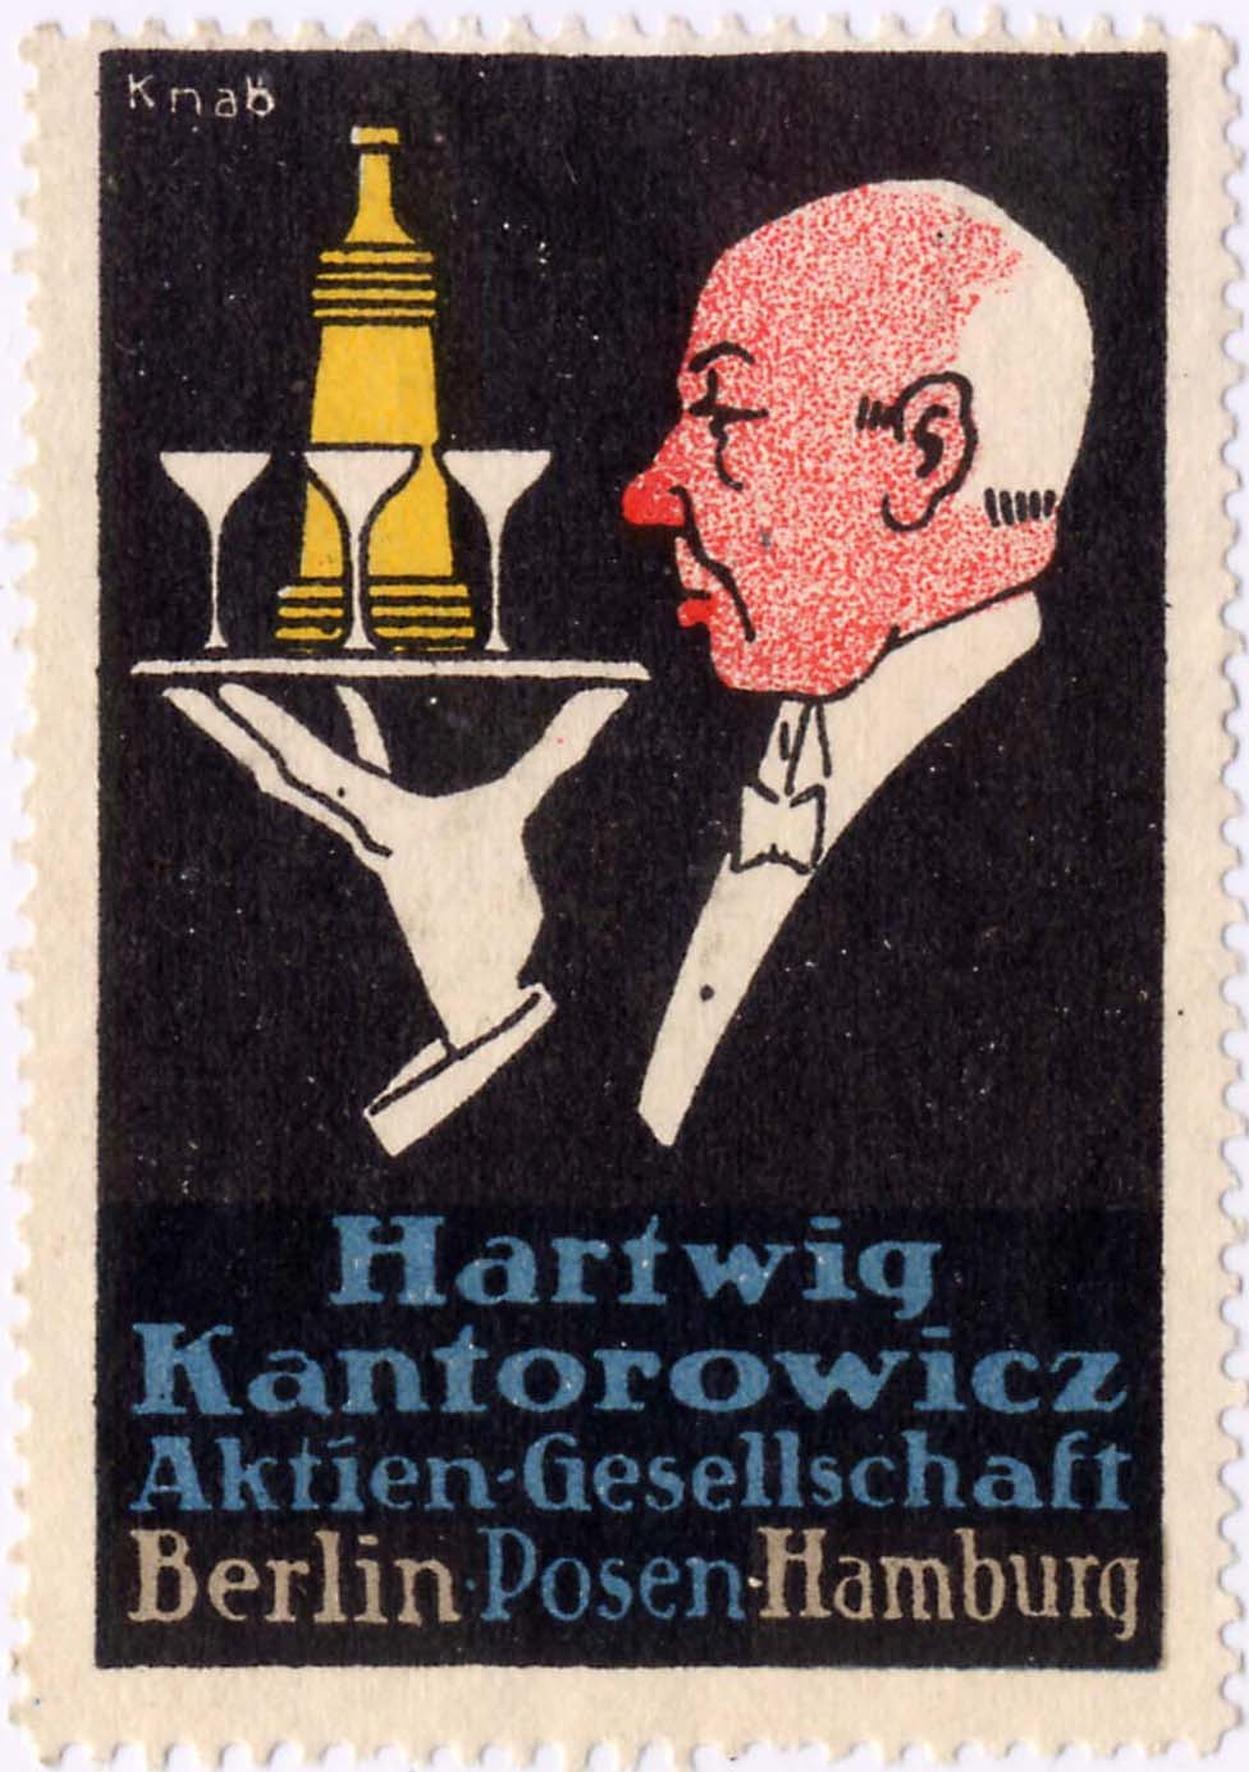 Kantorowicz Reklamemarke 2, © Stephan Becker, Brüssow